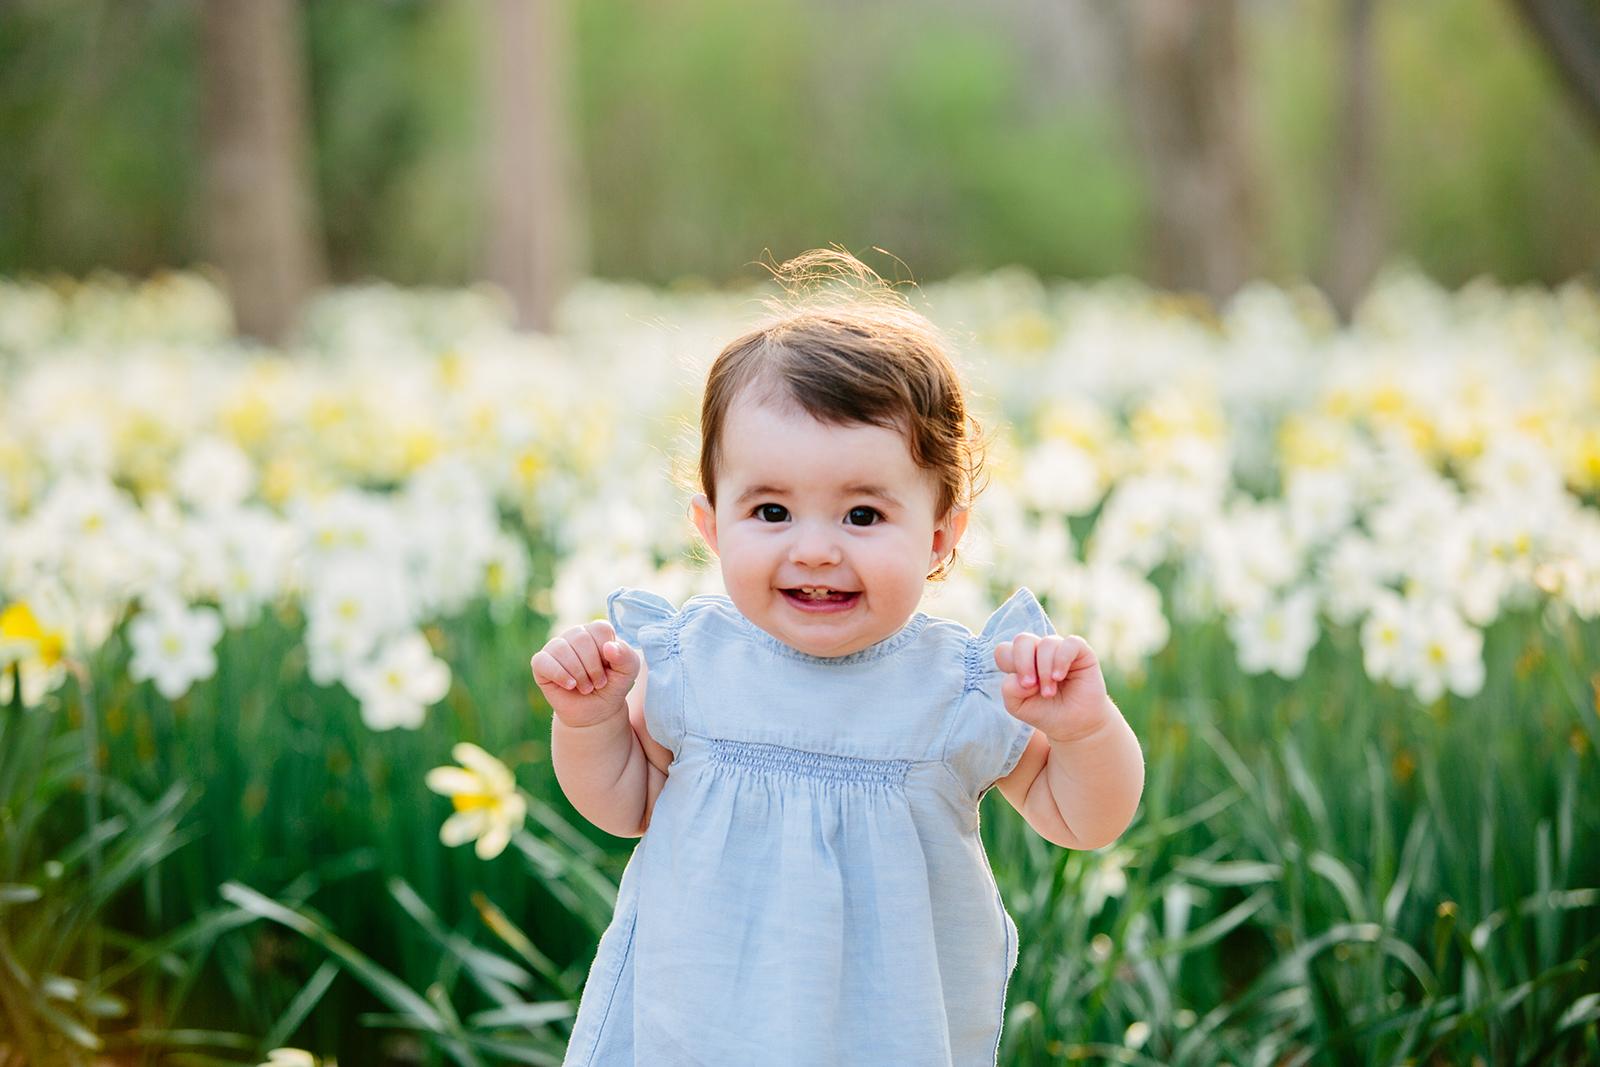 daffodil field dartmouth.jpg